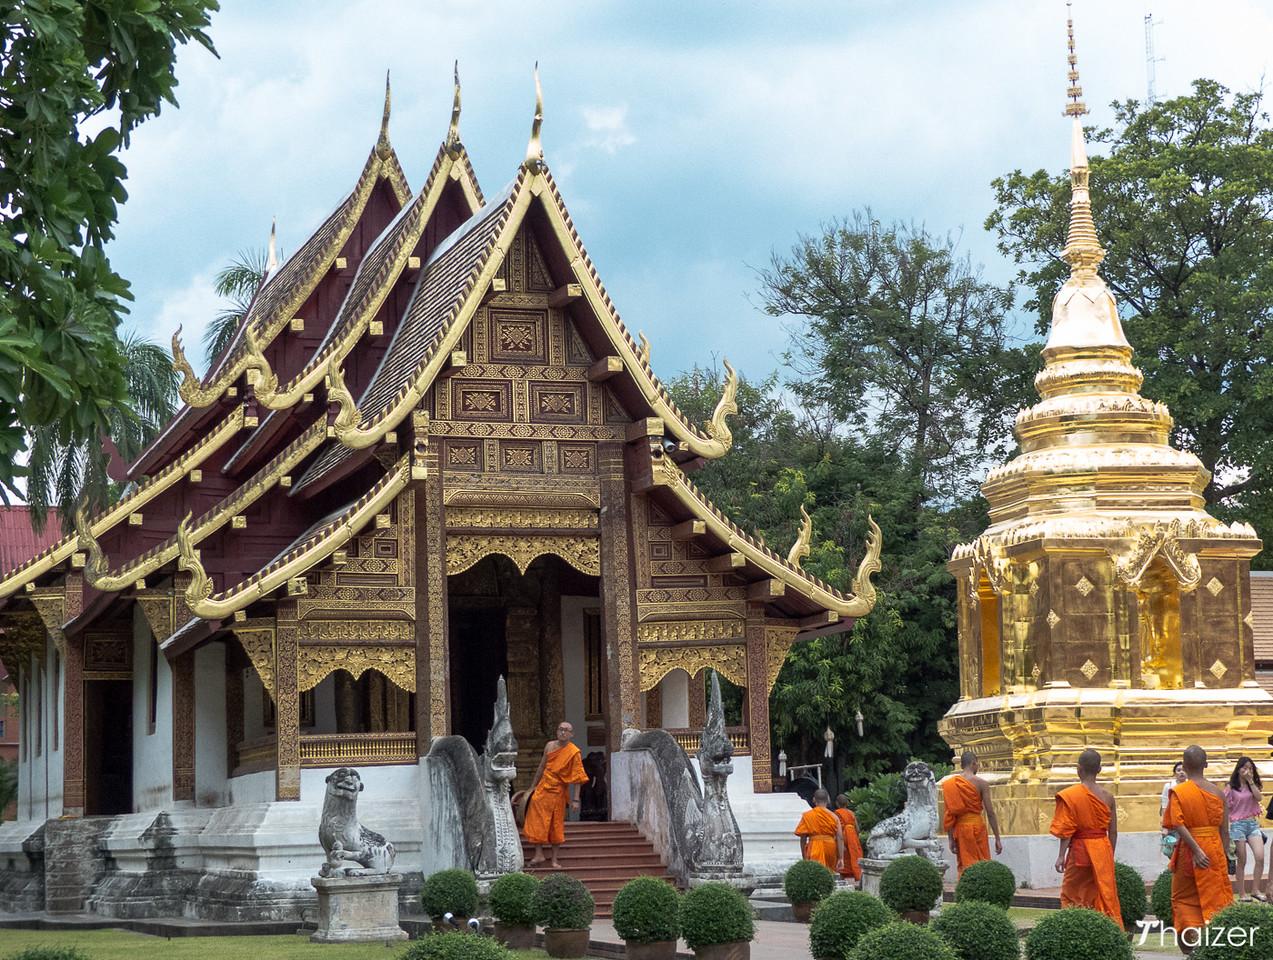 Wiharn Lai Kham, Wat Phra Singh in Chiang Mai